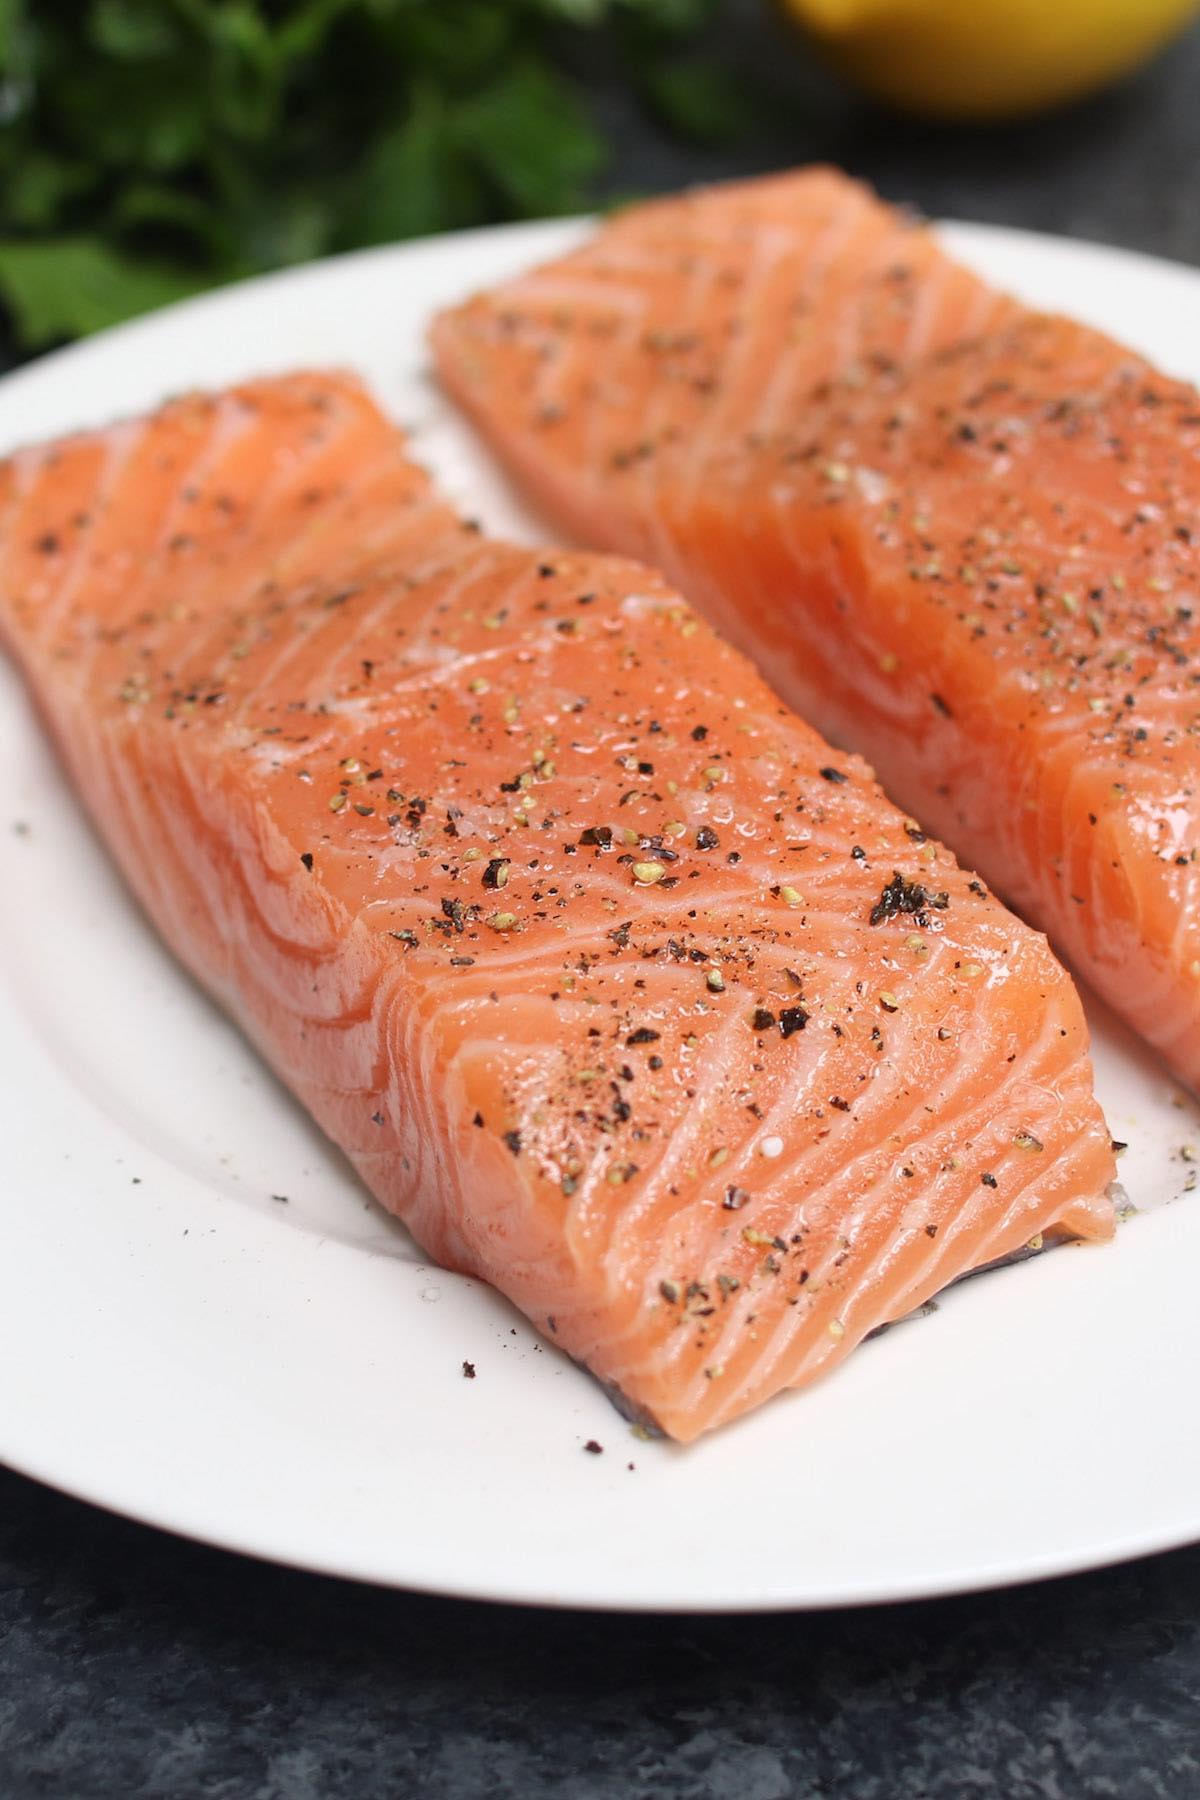 Dry seasoned salmon fillets ready for baking